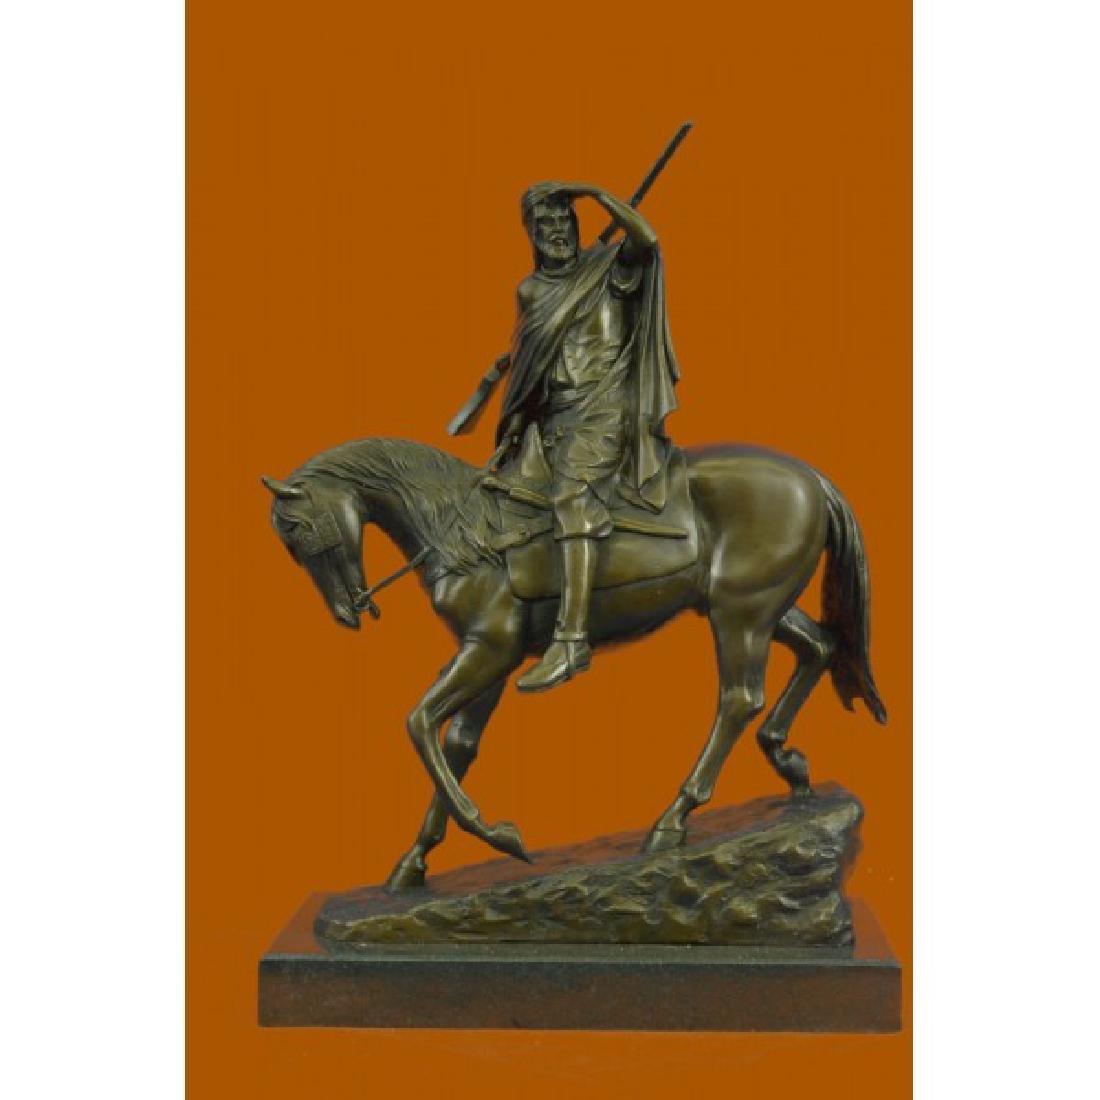 Bonheur Arab Man On a Horse Bronze Sculpture Museum